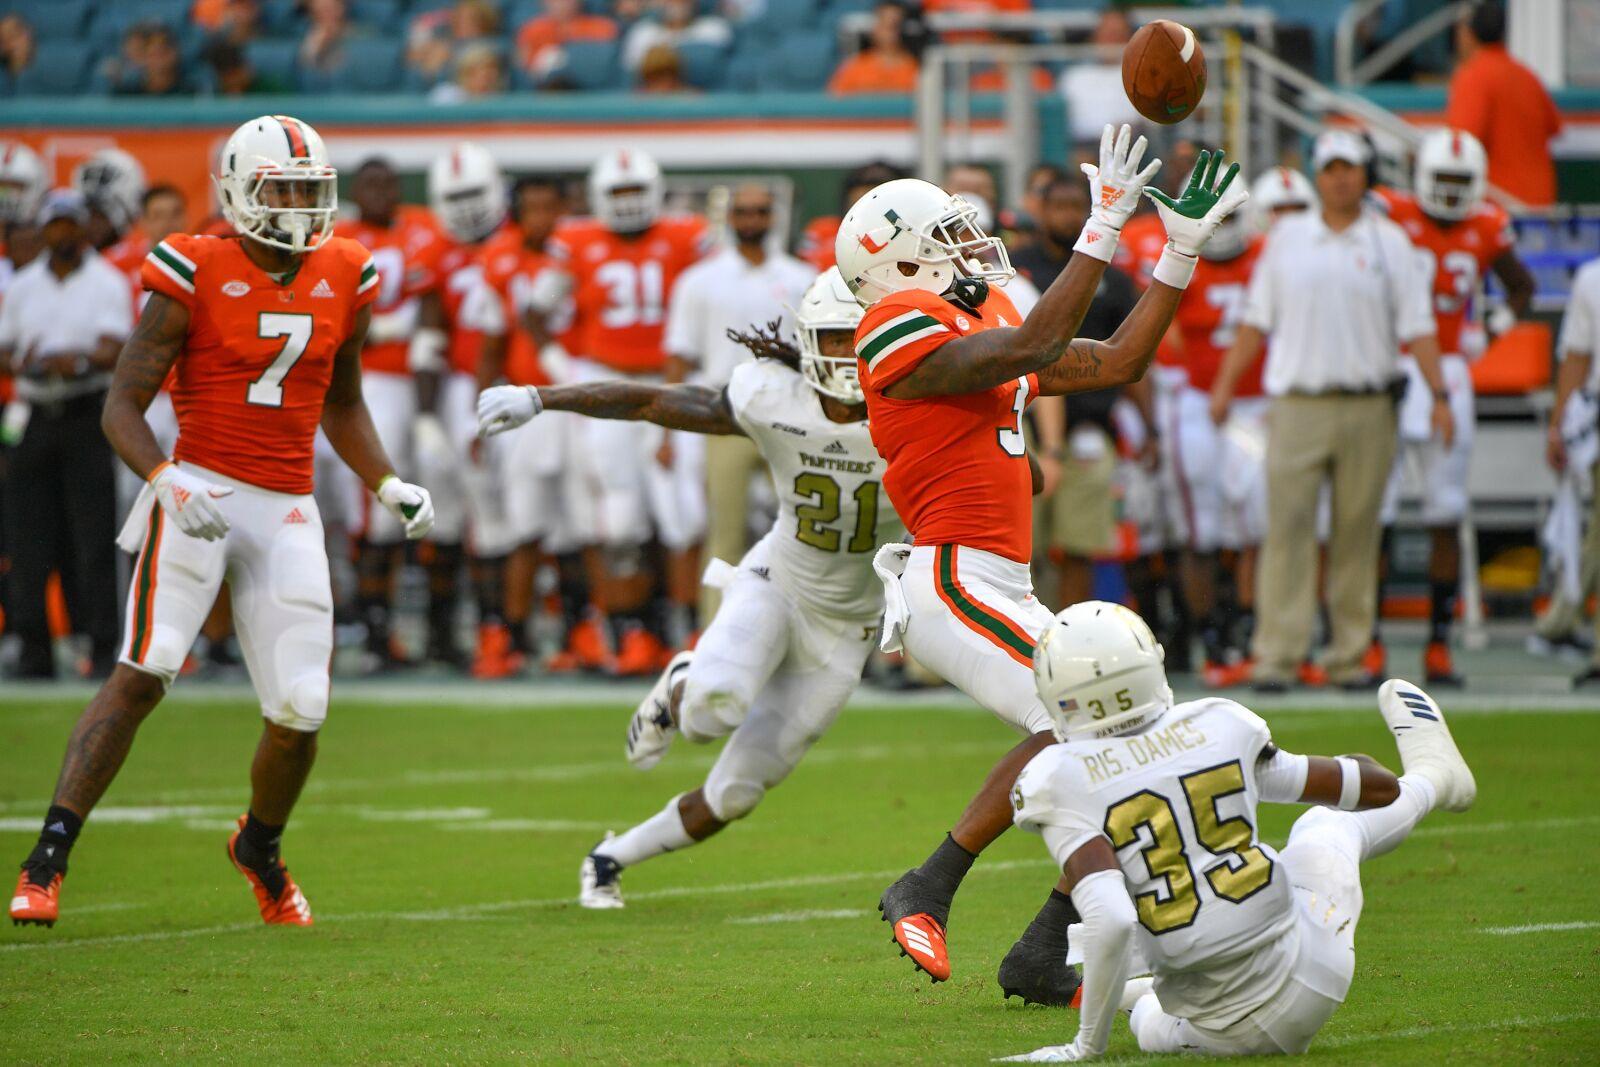 Miami football recruiting: 2021 class building deep WR group